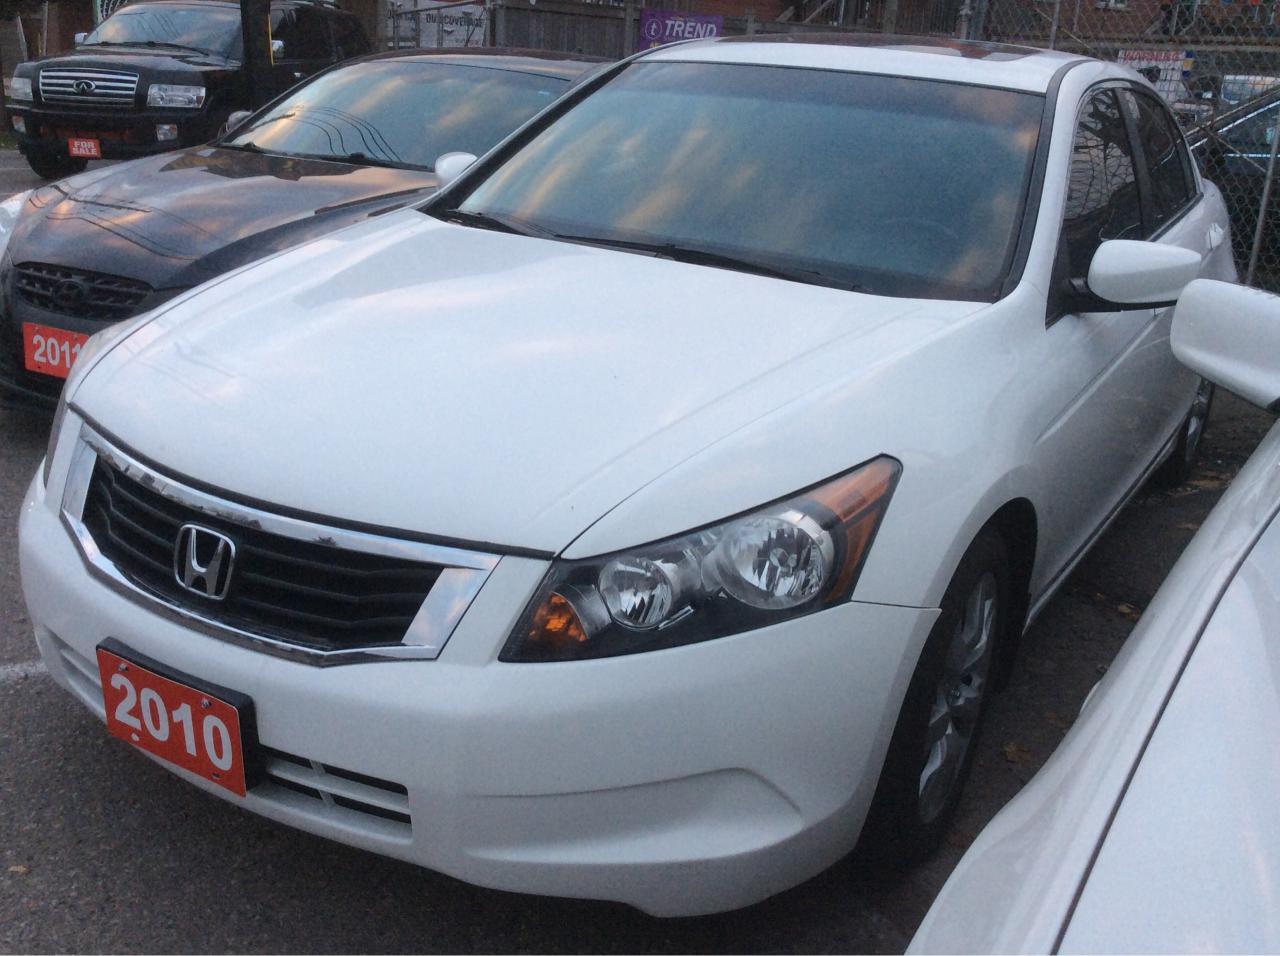 2010 Honda Accord 2.4L/EX-L/Leather/Sunroof/Heated Seats/Alloys